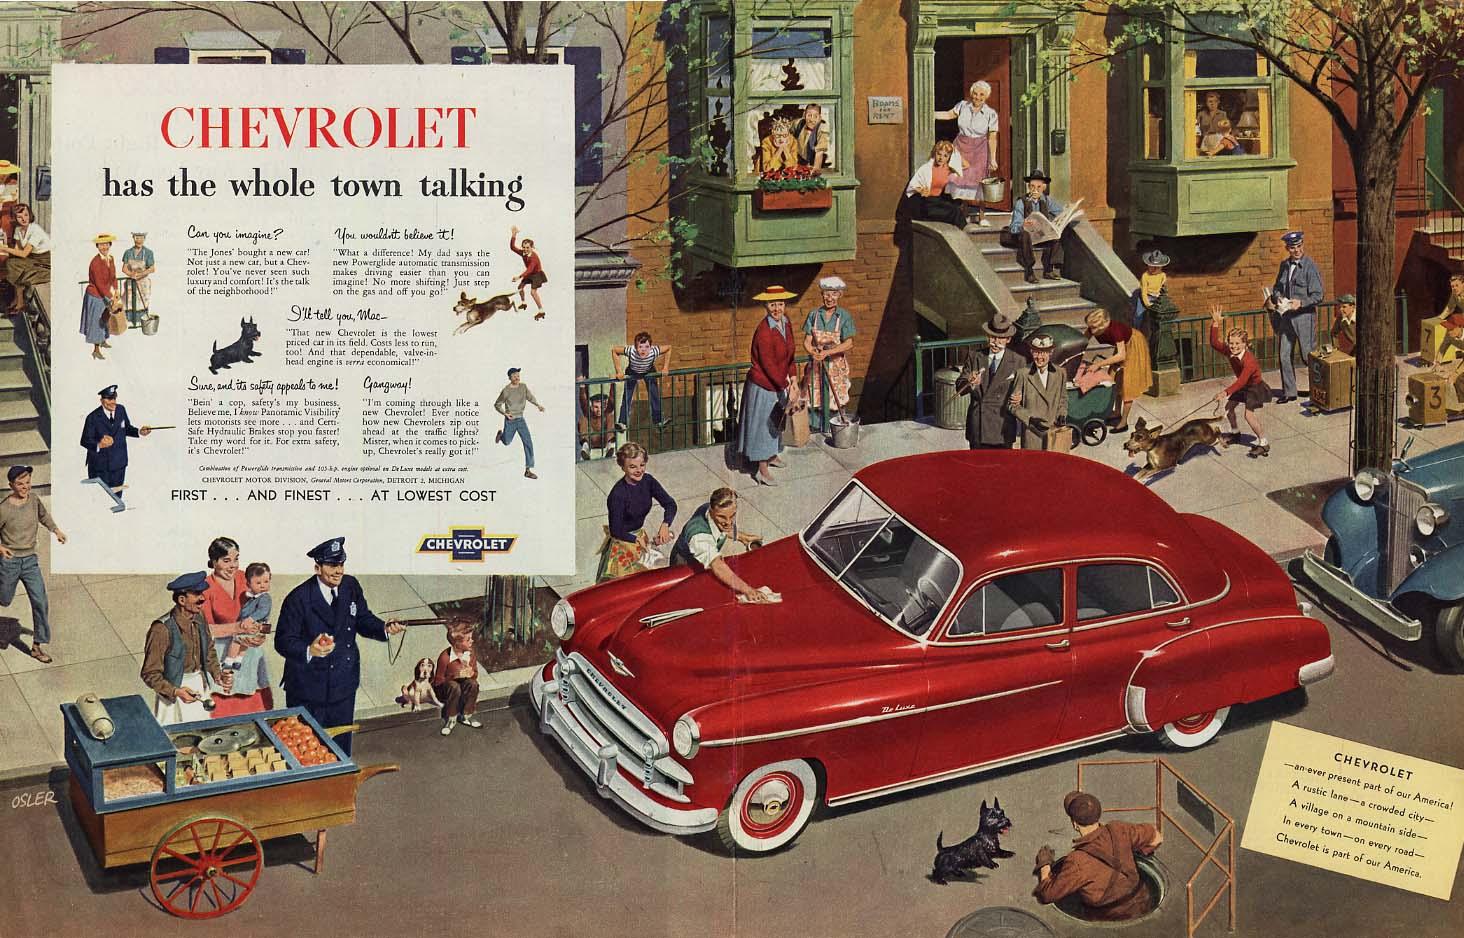 Chevrolet De Luxe Sedan has the whole town talking! Ad 1950